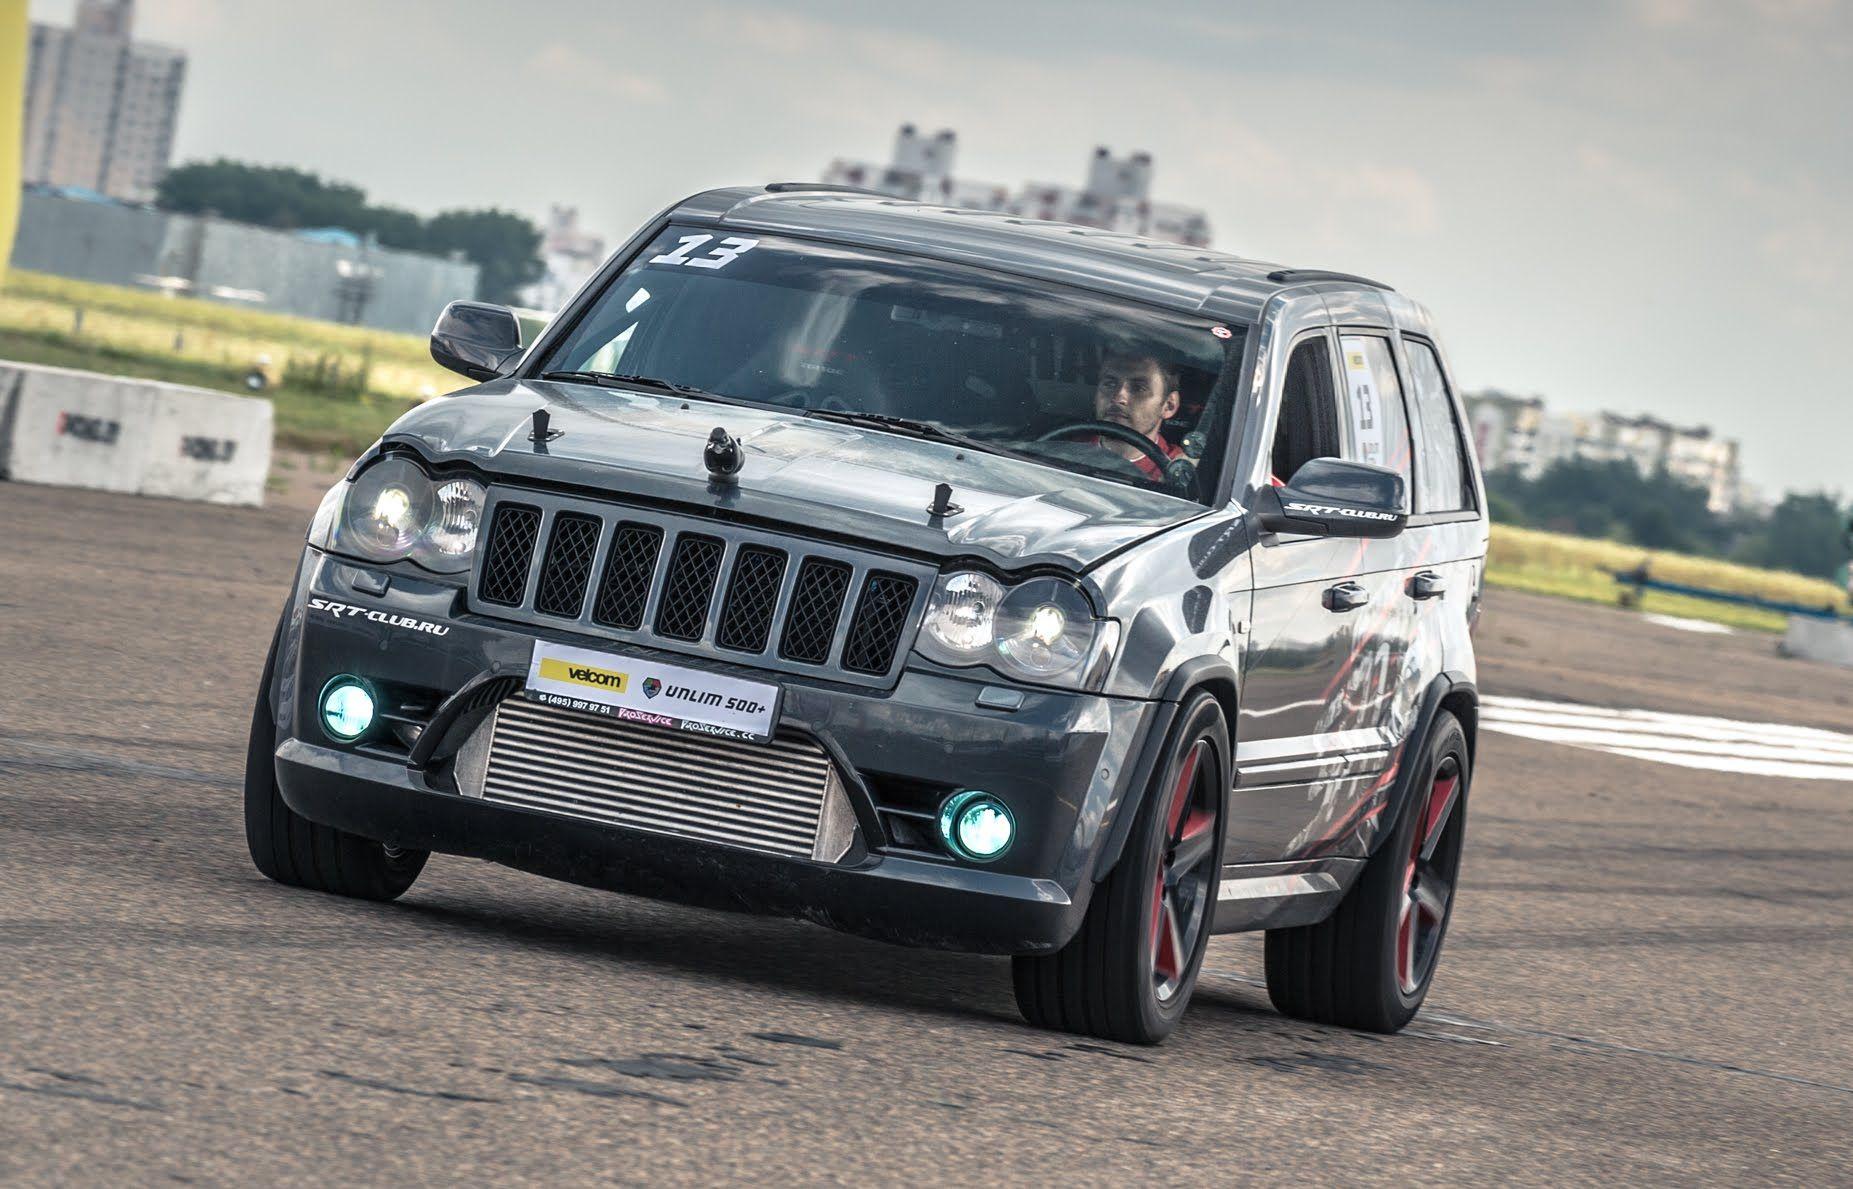 Jeep Srt8 Turbo Vs Lamborghini Gallardo Vs Nissan Gt R Jeep Srt8